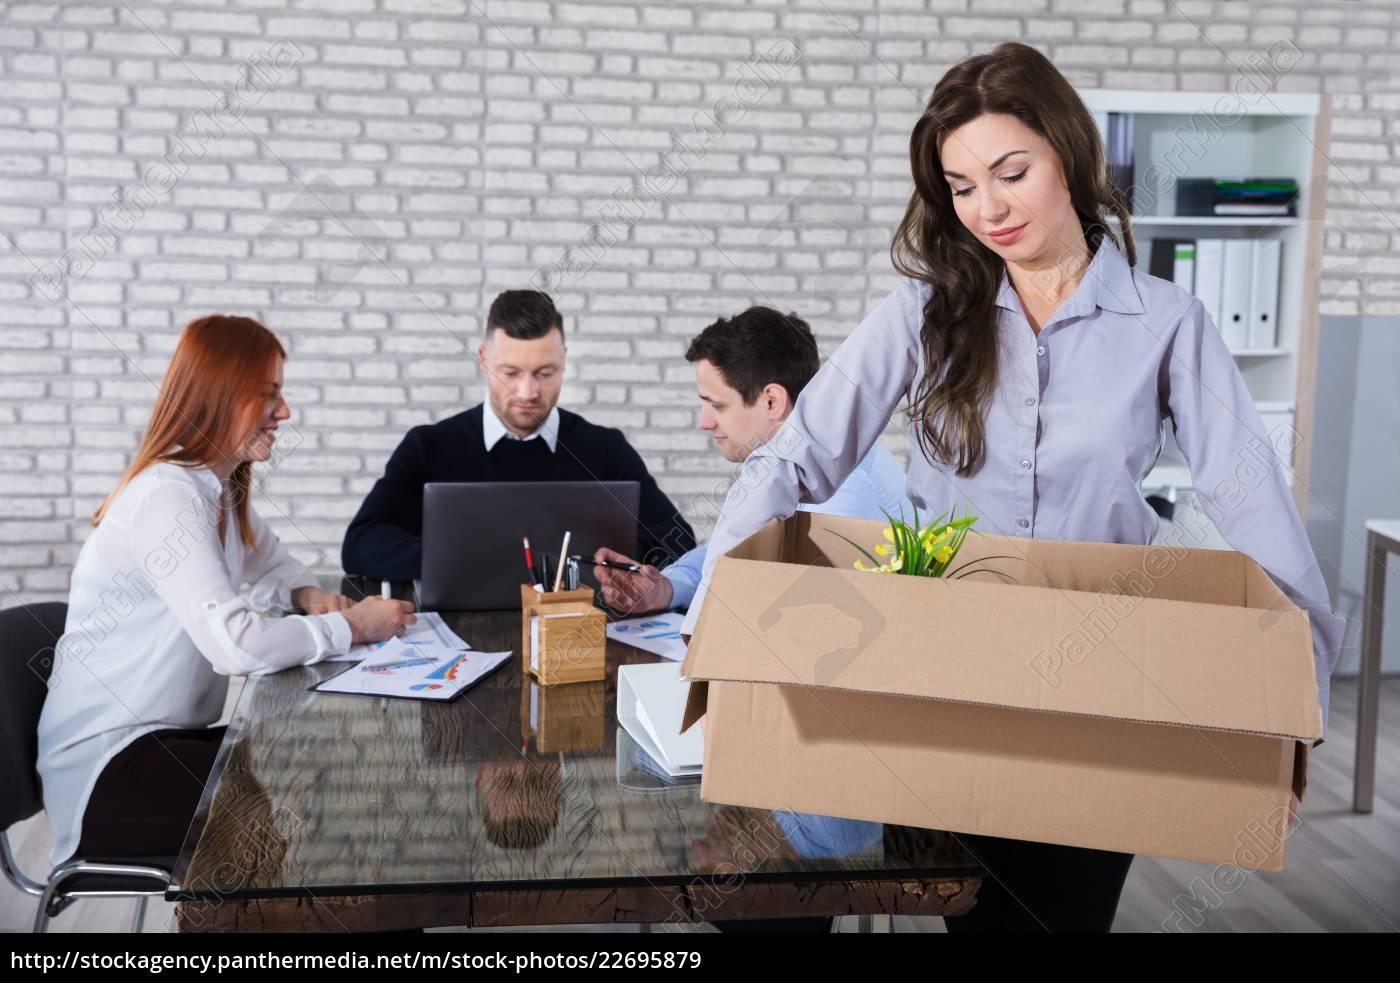 fired, employee, with, belongings - 22695879